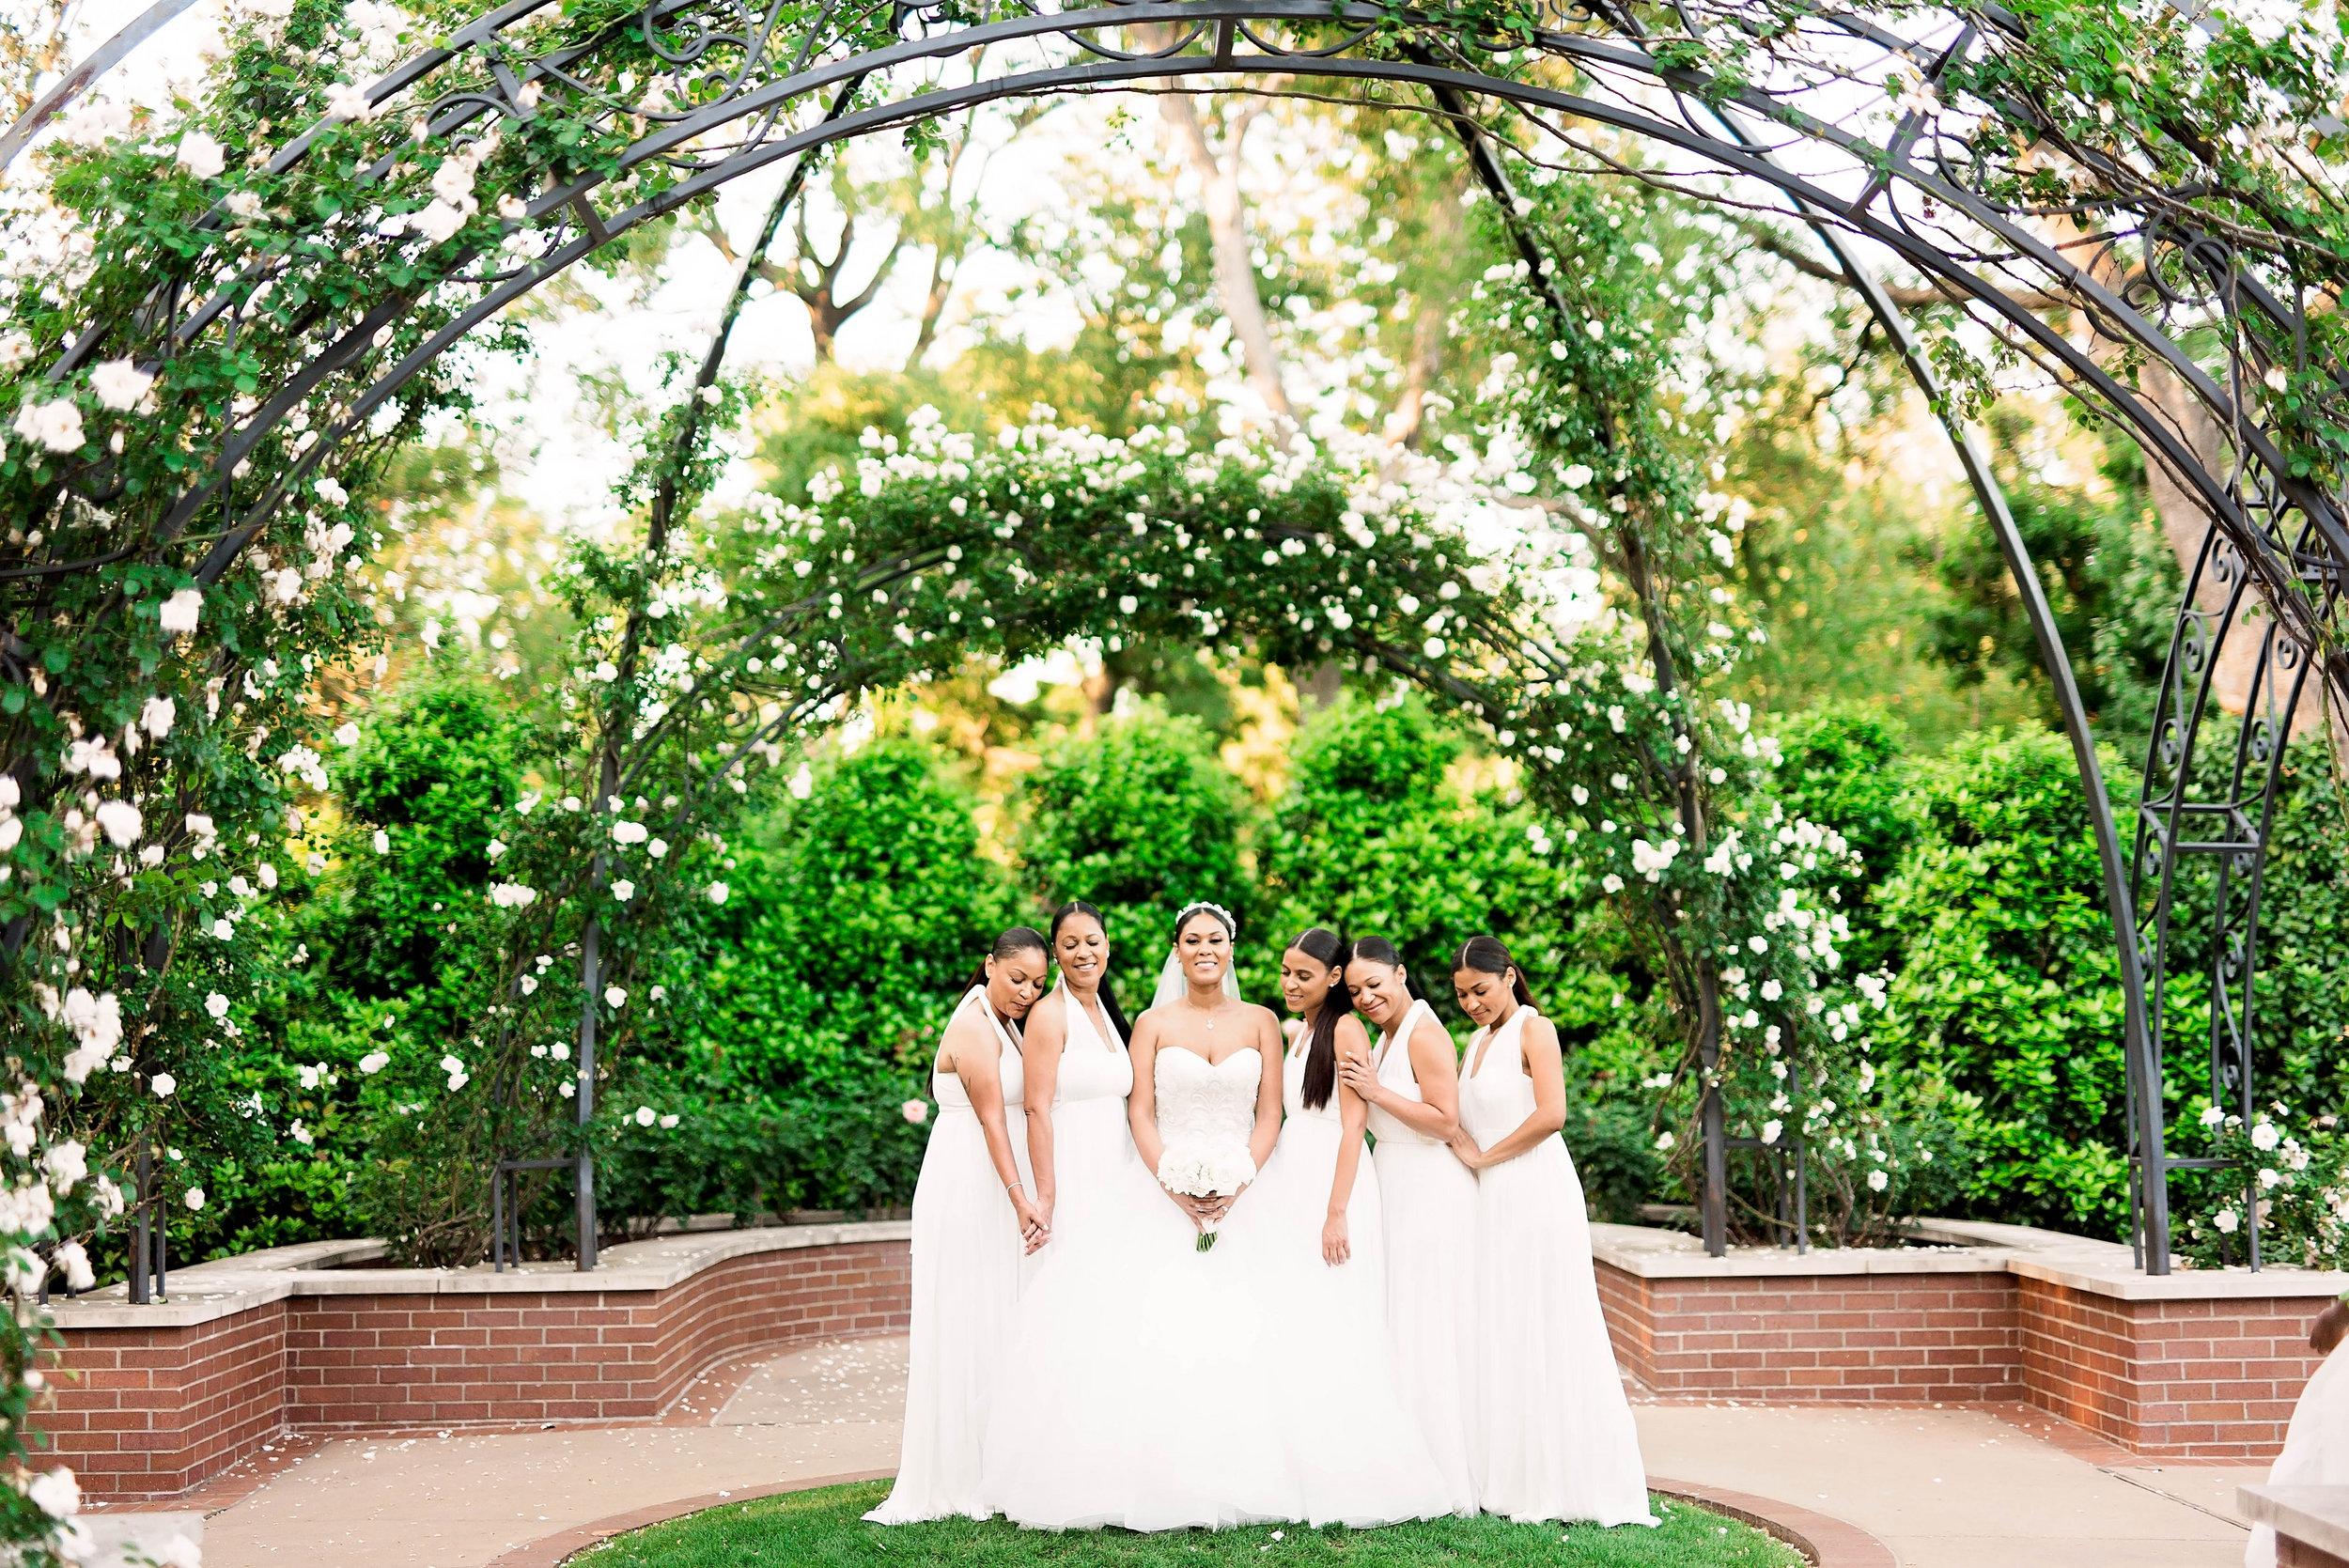 Kerri-Bravion-Wedding-PharrisPhotos-0033.jpg